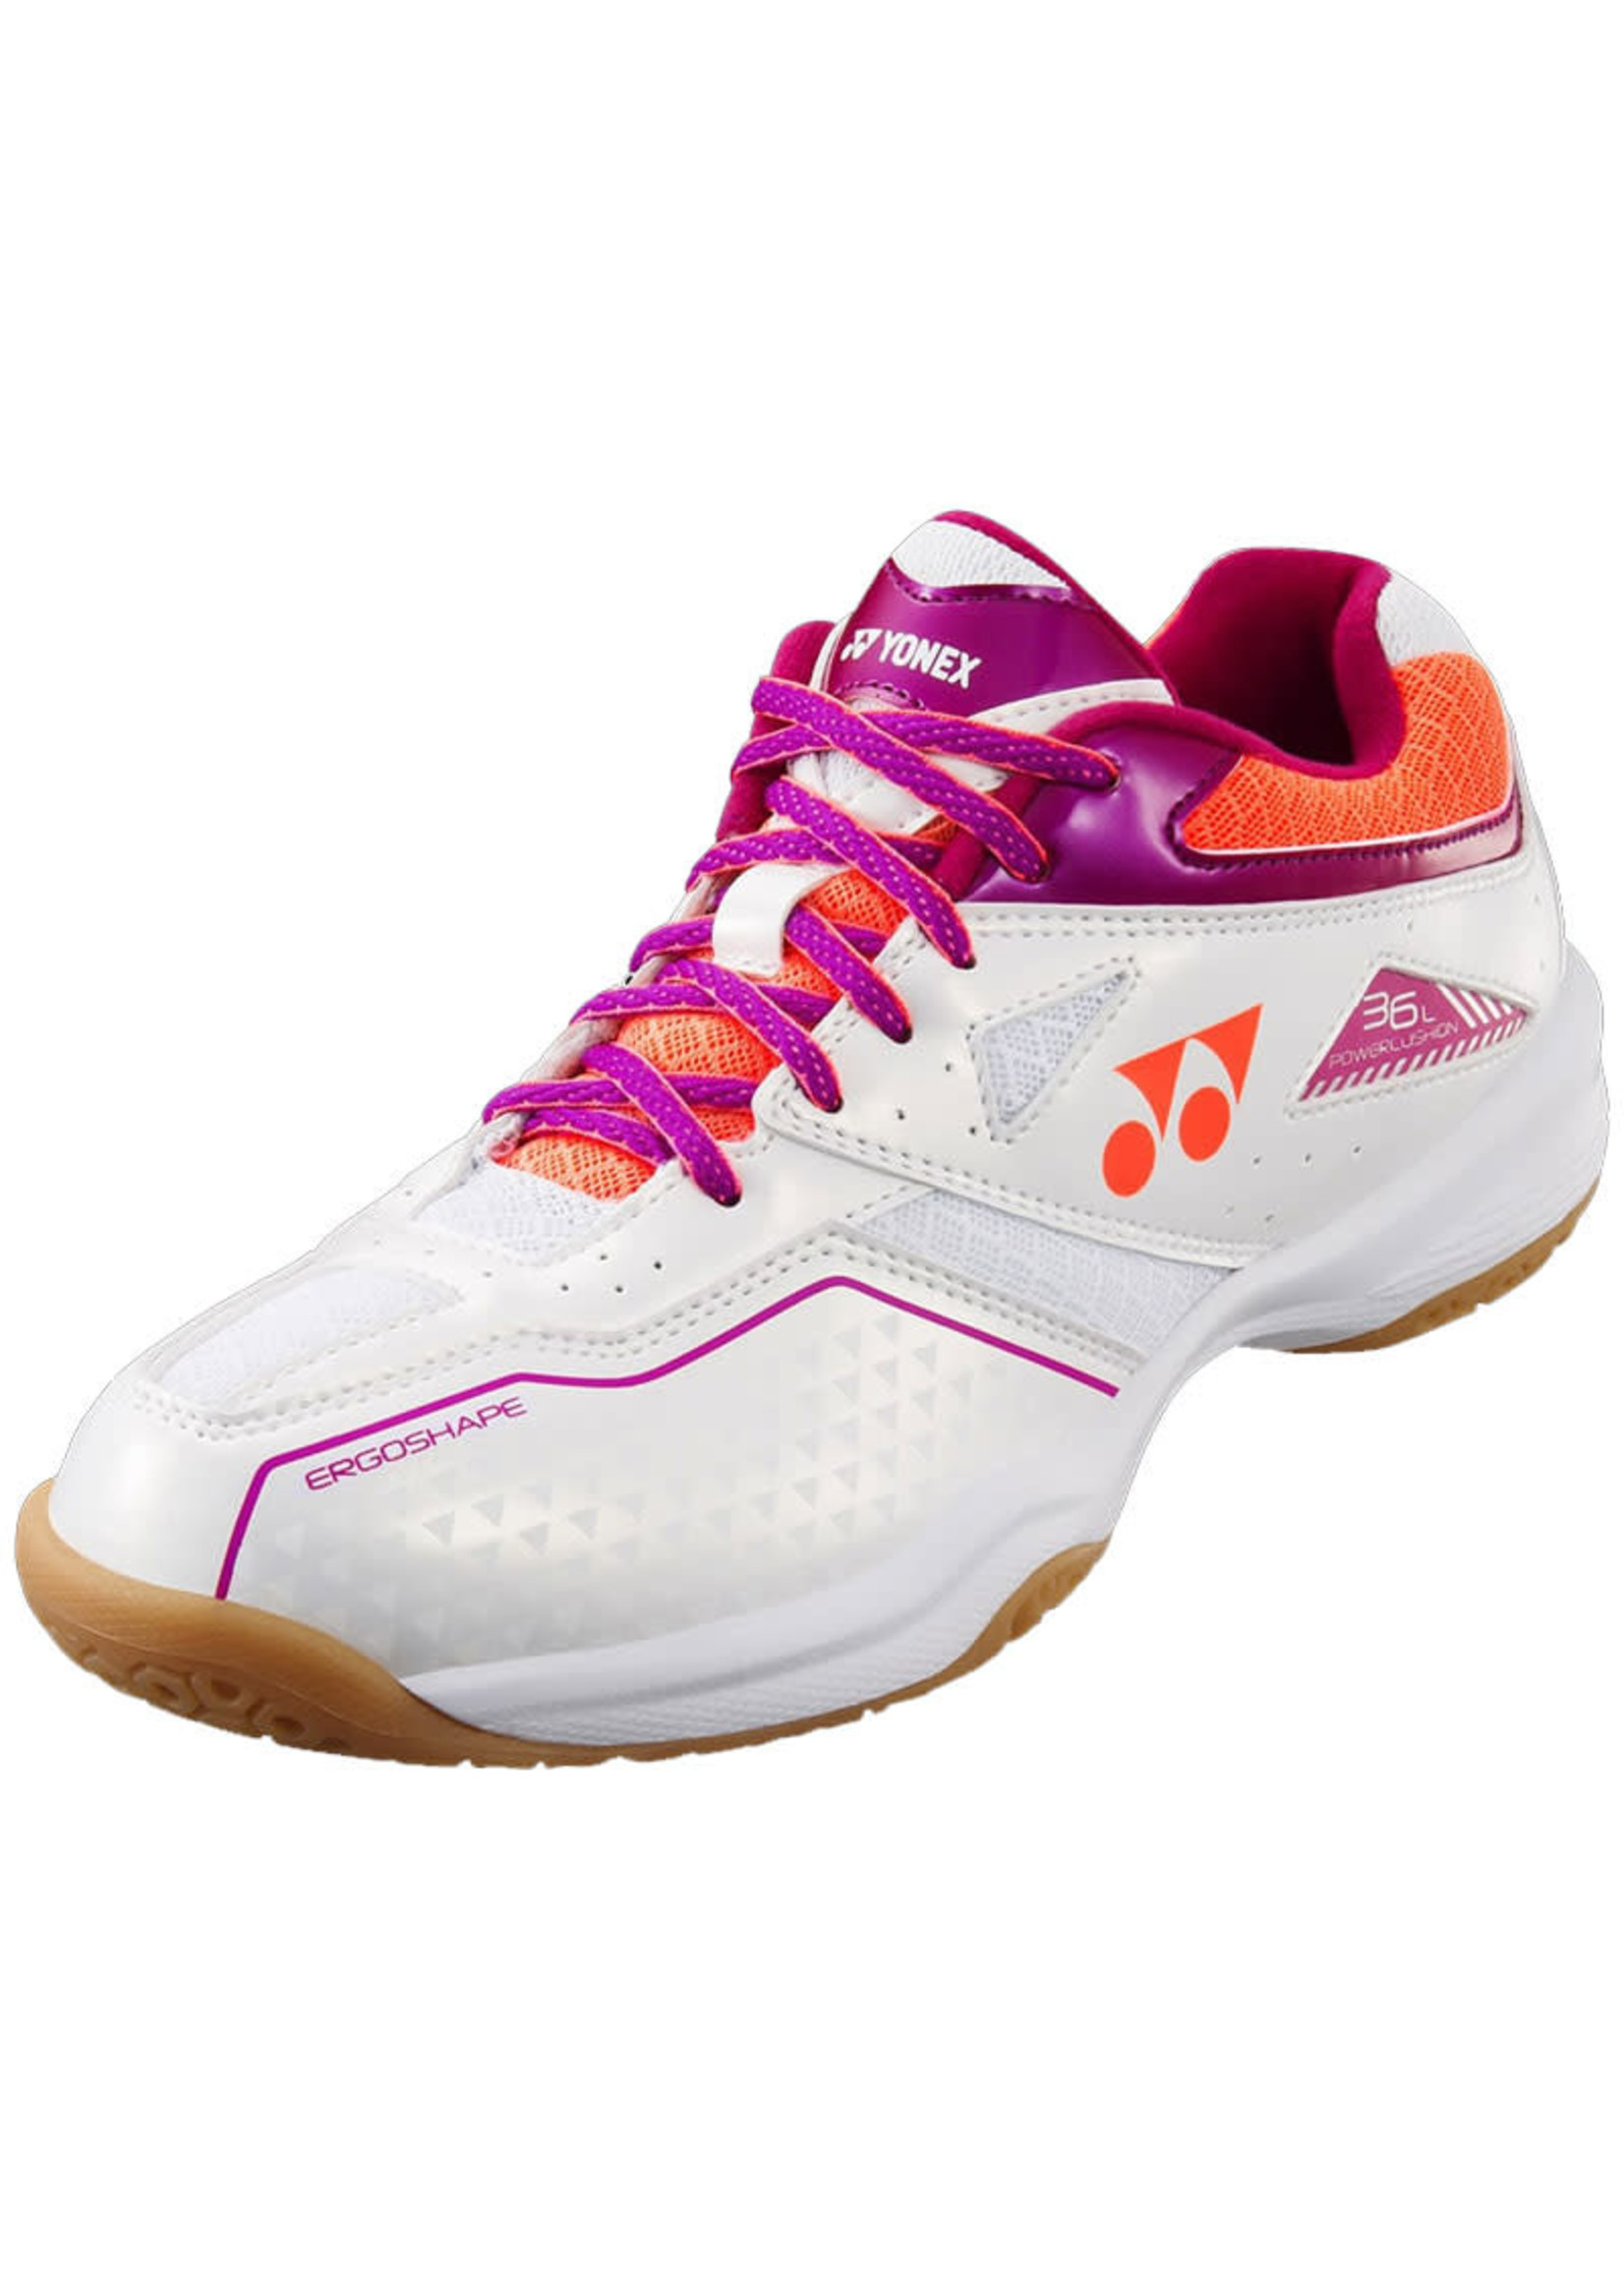 Yonex Yonex Power Cushion 36 Ladies Badminton Shoe (2019)